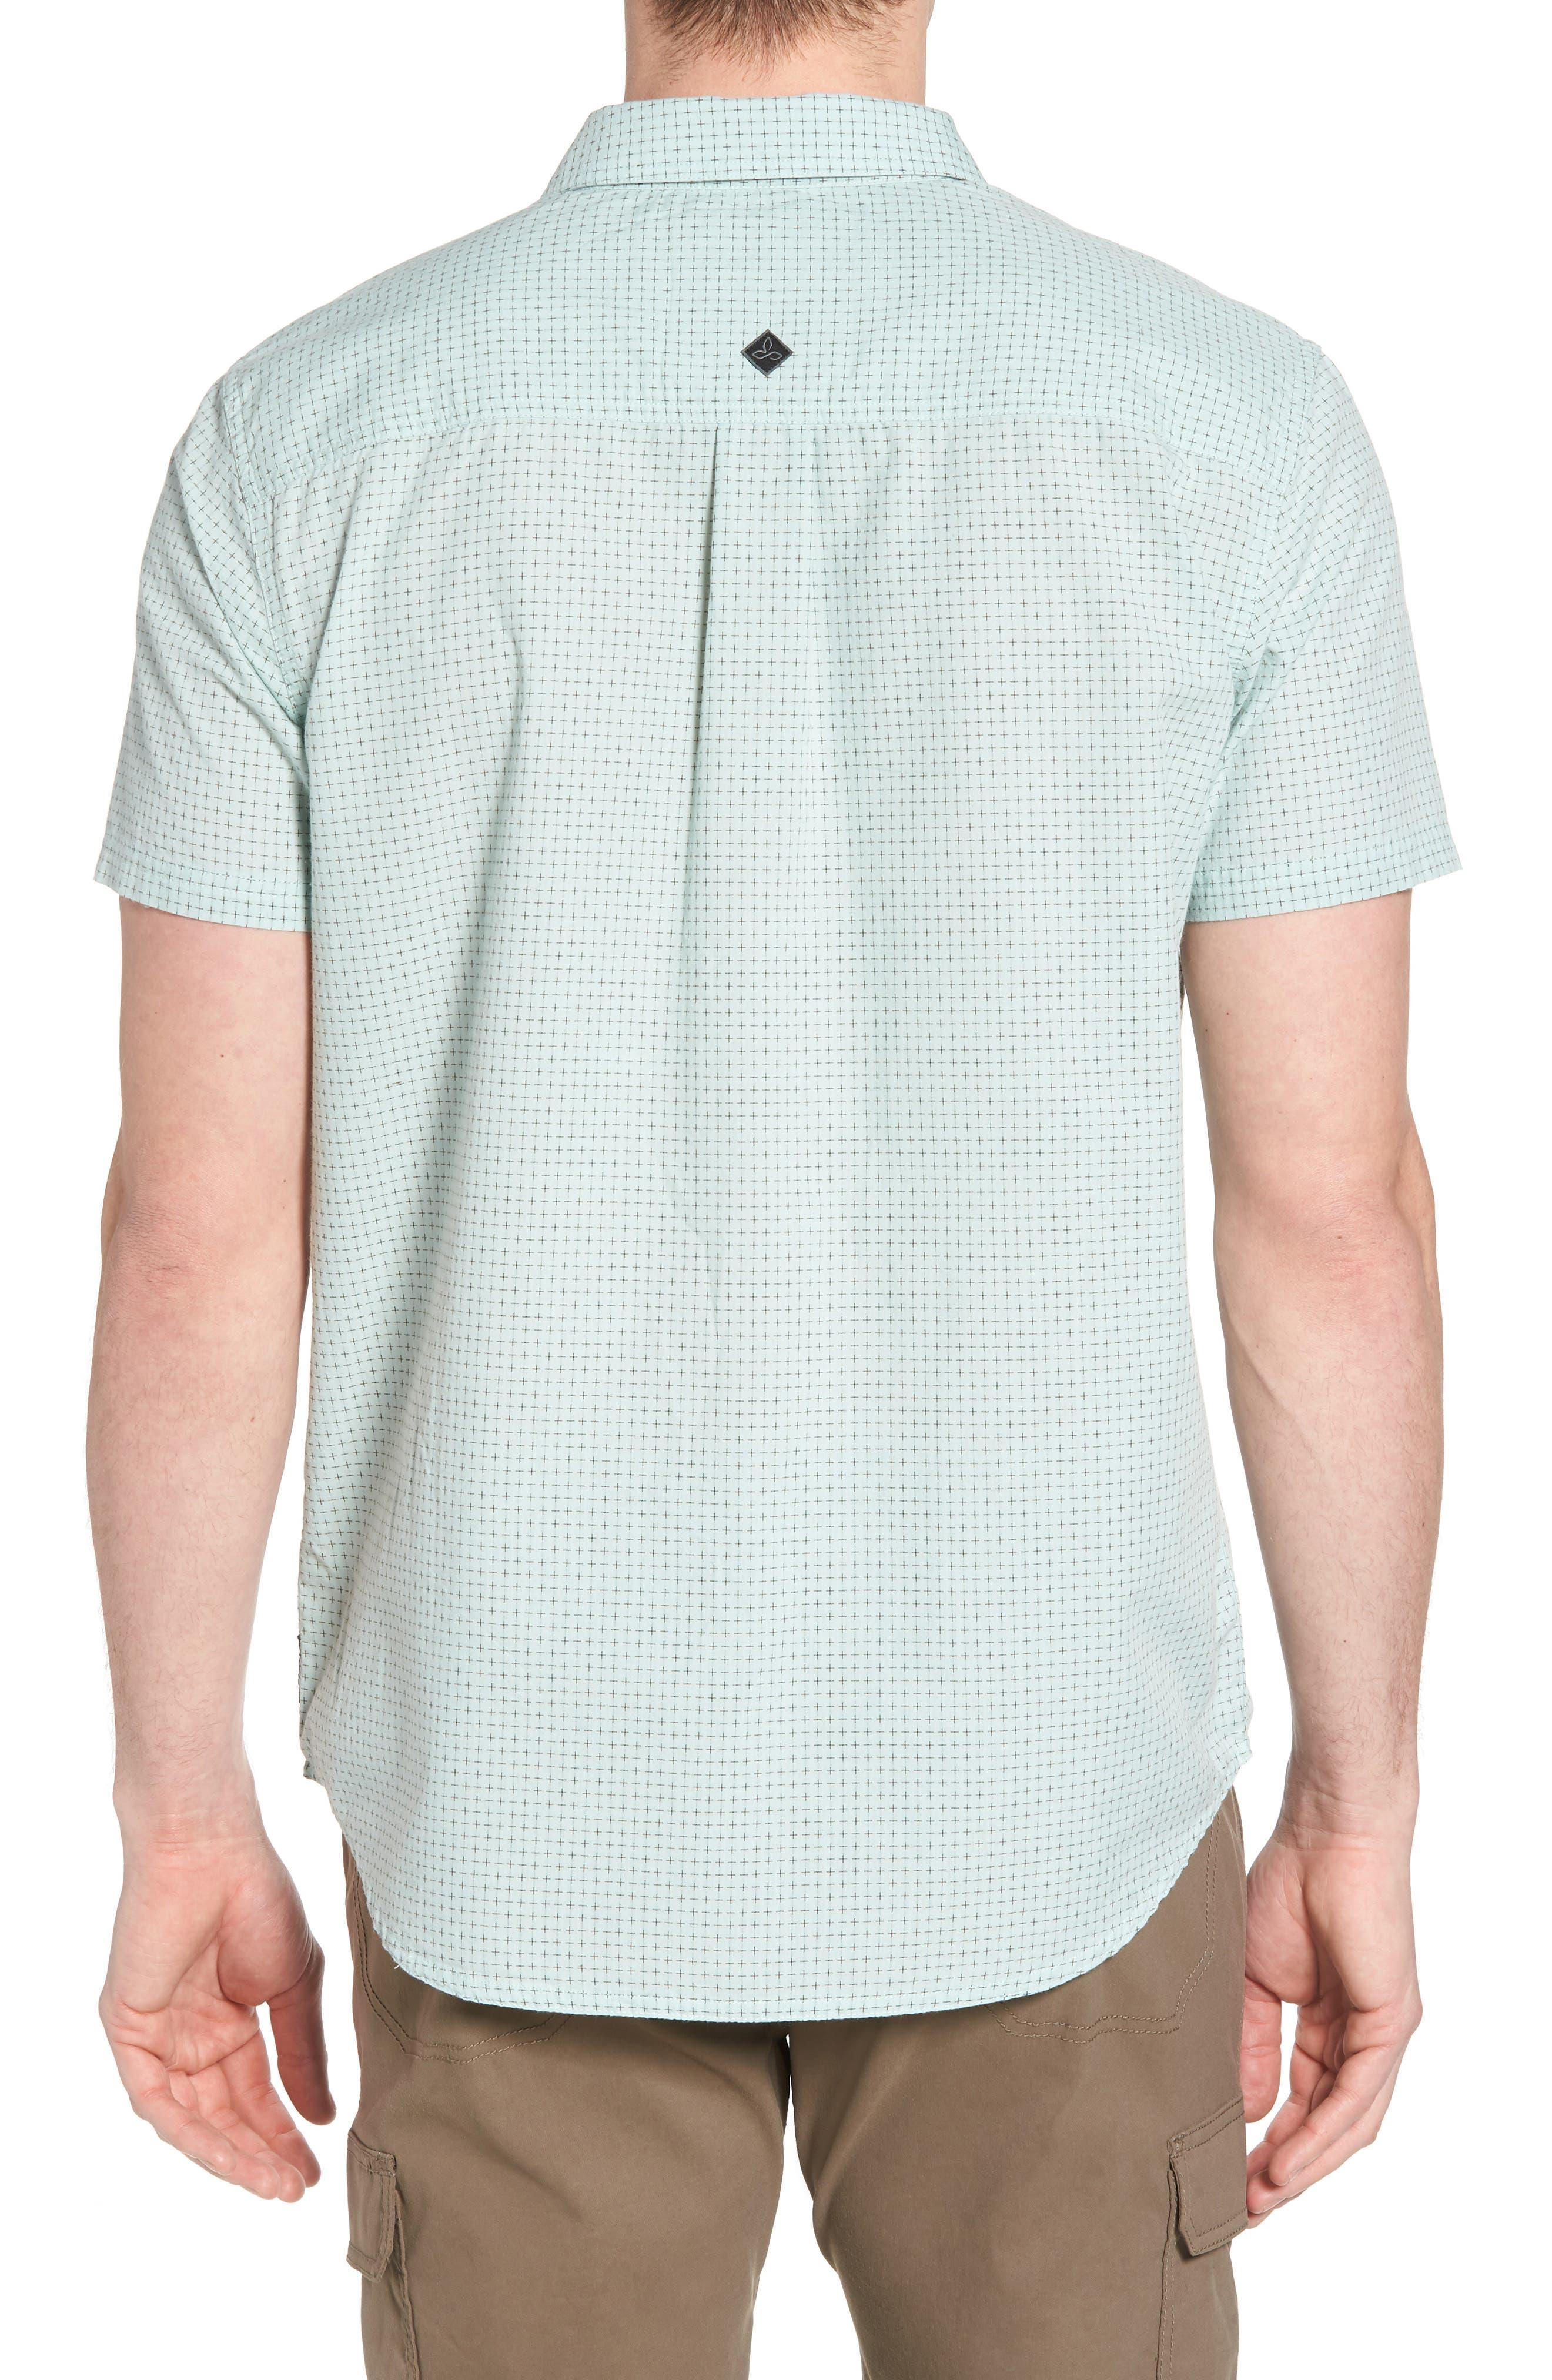 Blakely Slim Fit Short Sleeve Sport Shirt,                             Alternate thumbnail 2, color,                             300